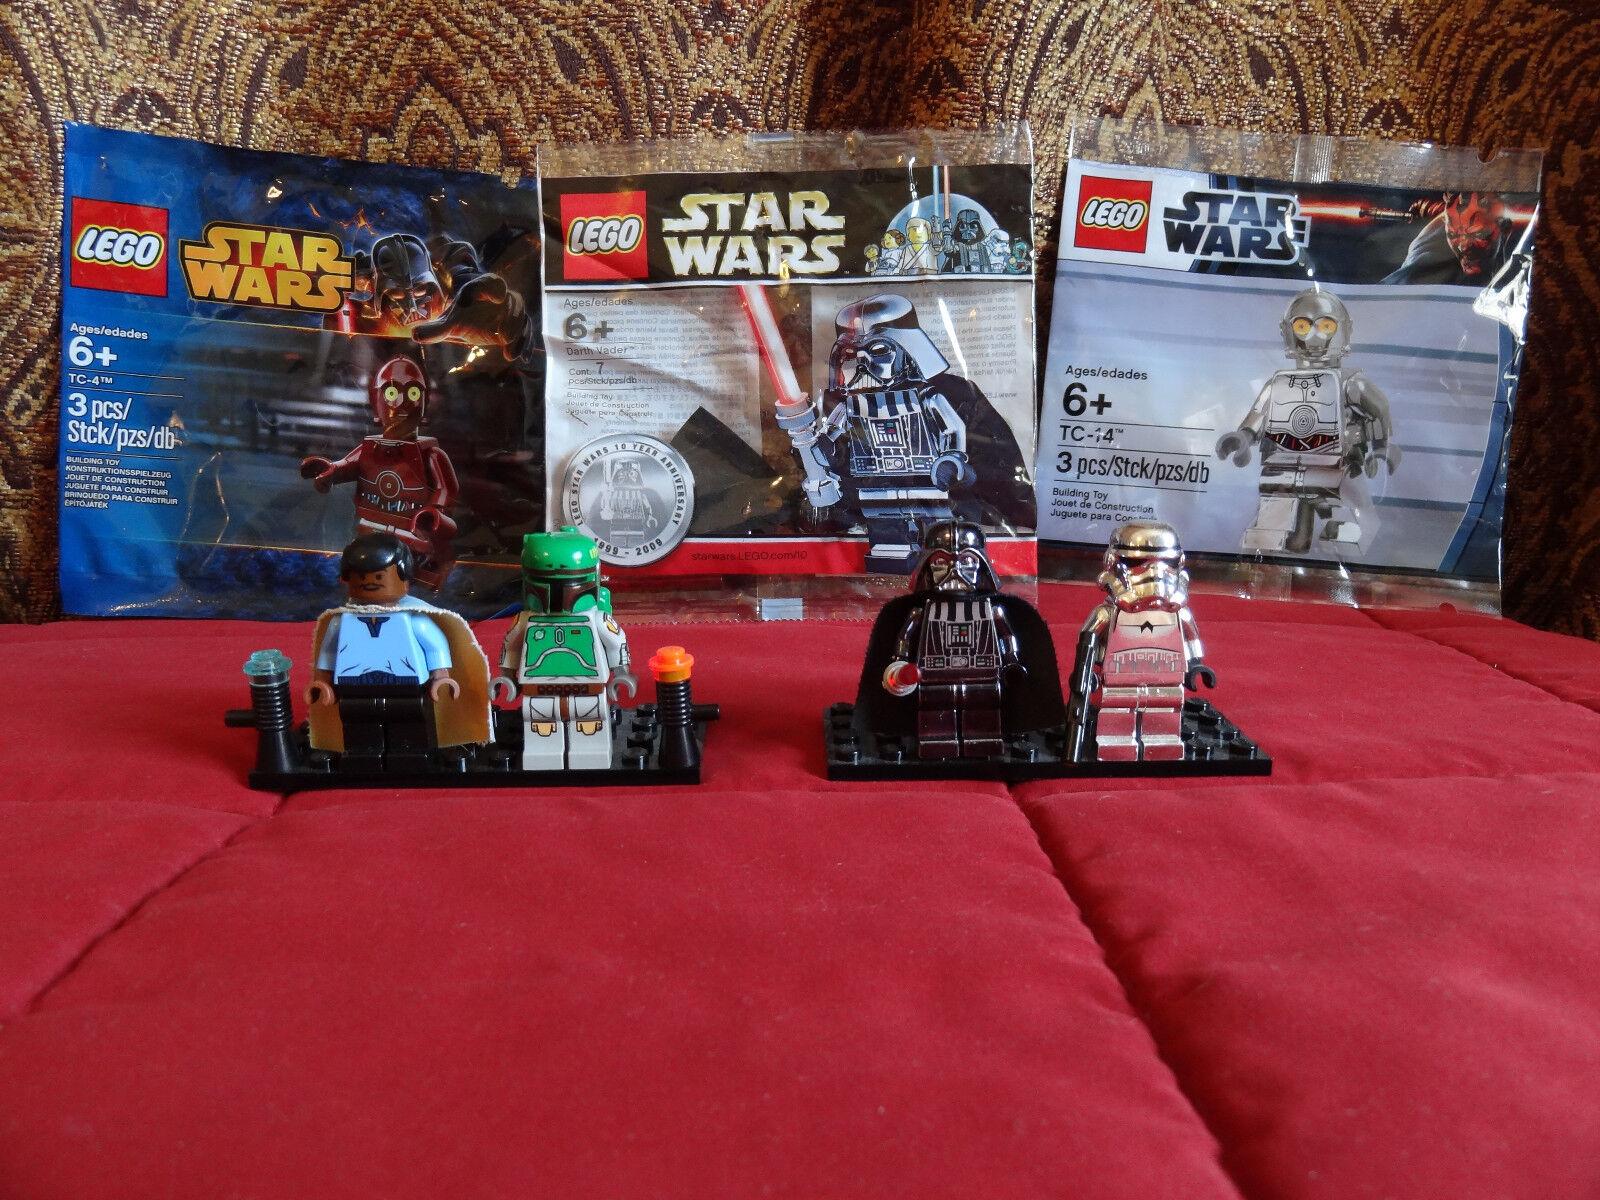 Lego Star Wars 10123 Cloud City Boba Fett Chrome Darth Vader Lando Calrissian